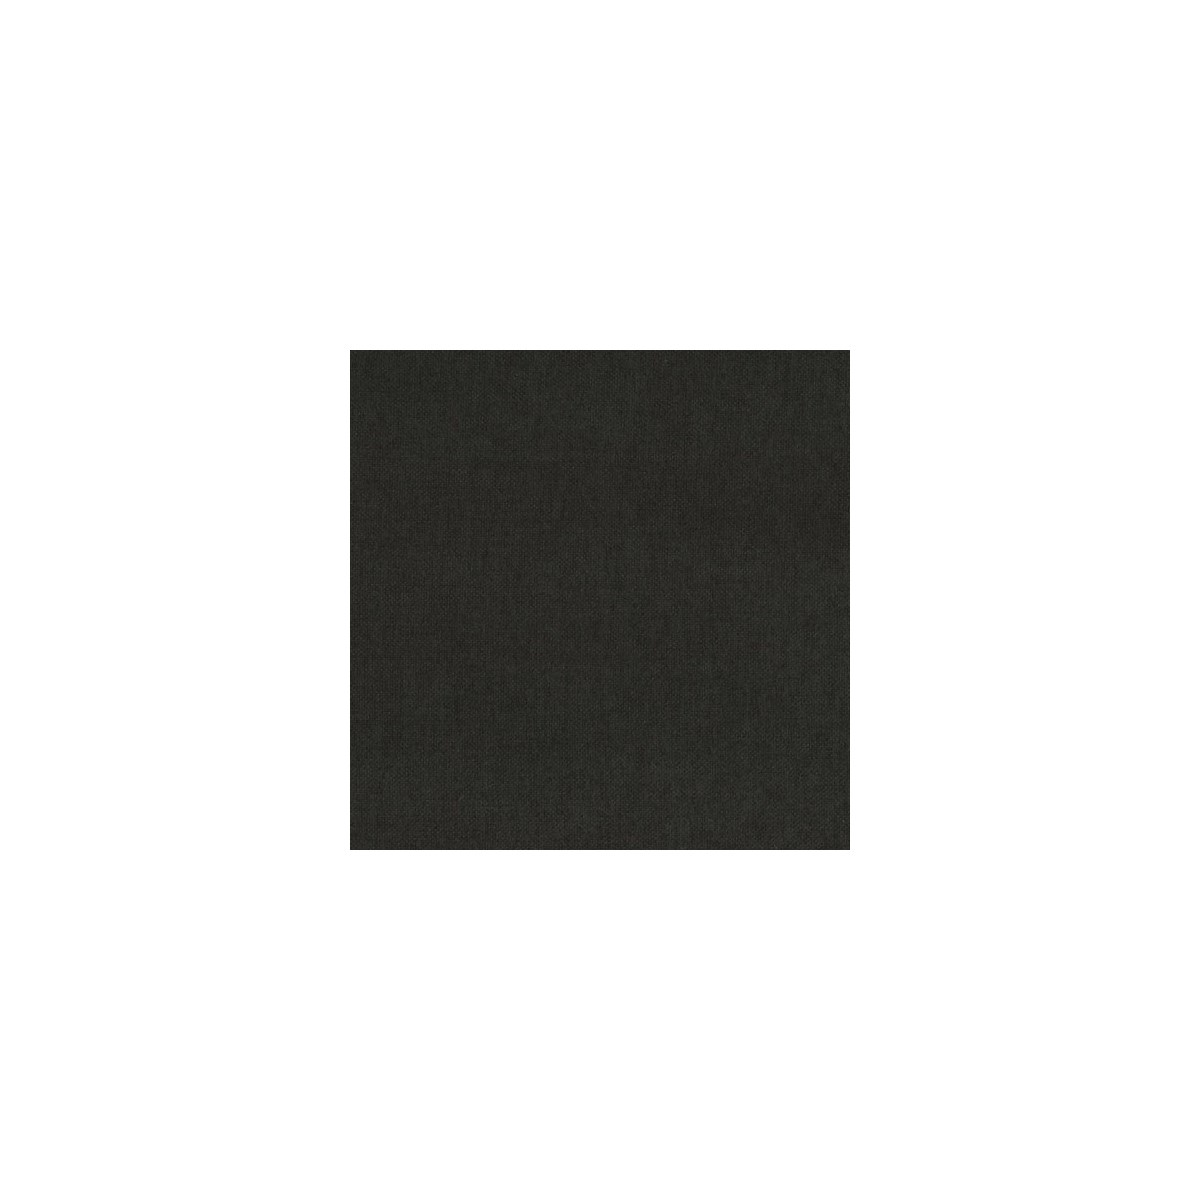 Alberta - Black Ink - Fabric By the Yard